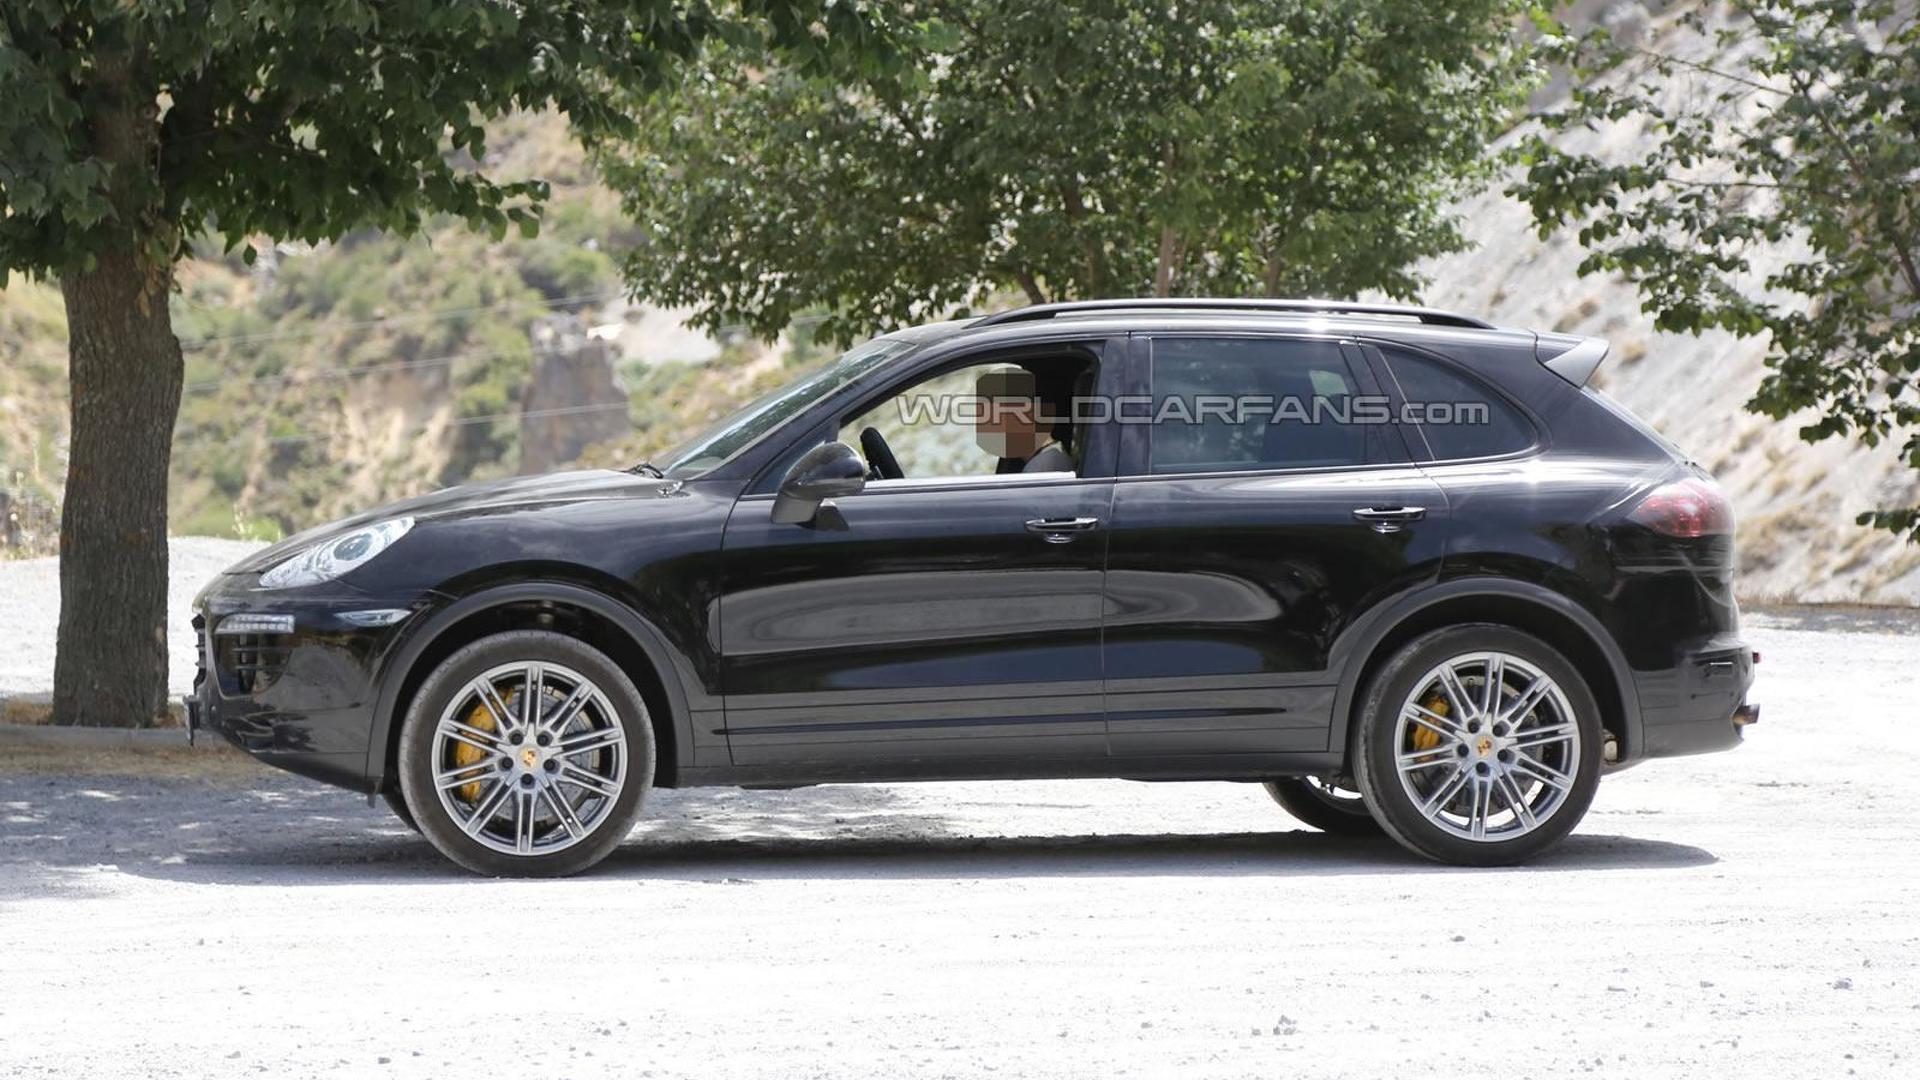 2015 Porsche Cayenne spied testing in Southern Europe